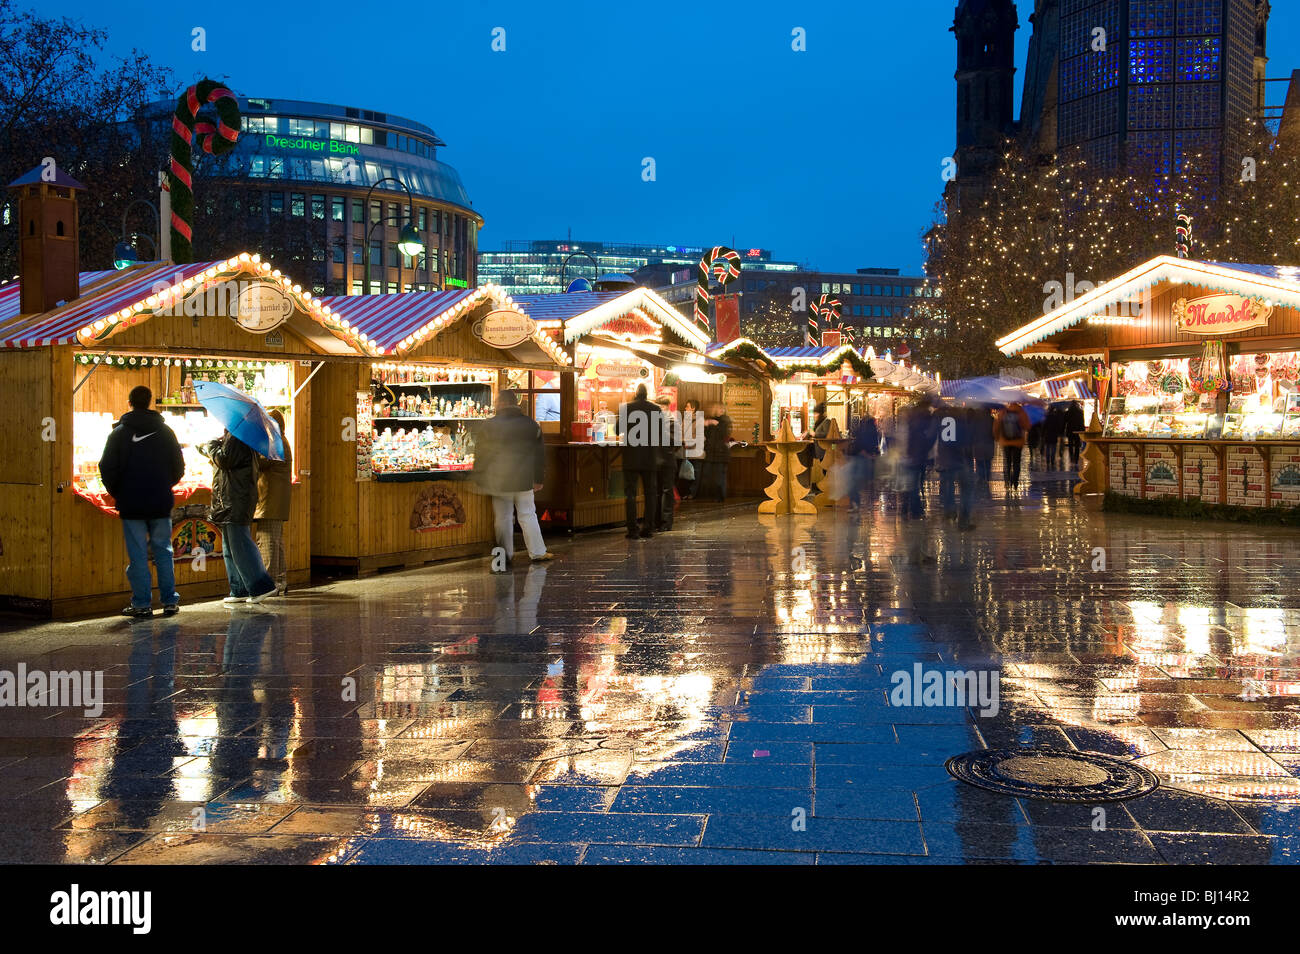 Christmas Markets on the  Kurfurstendamm, Berlin. Germany - Stock Image